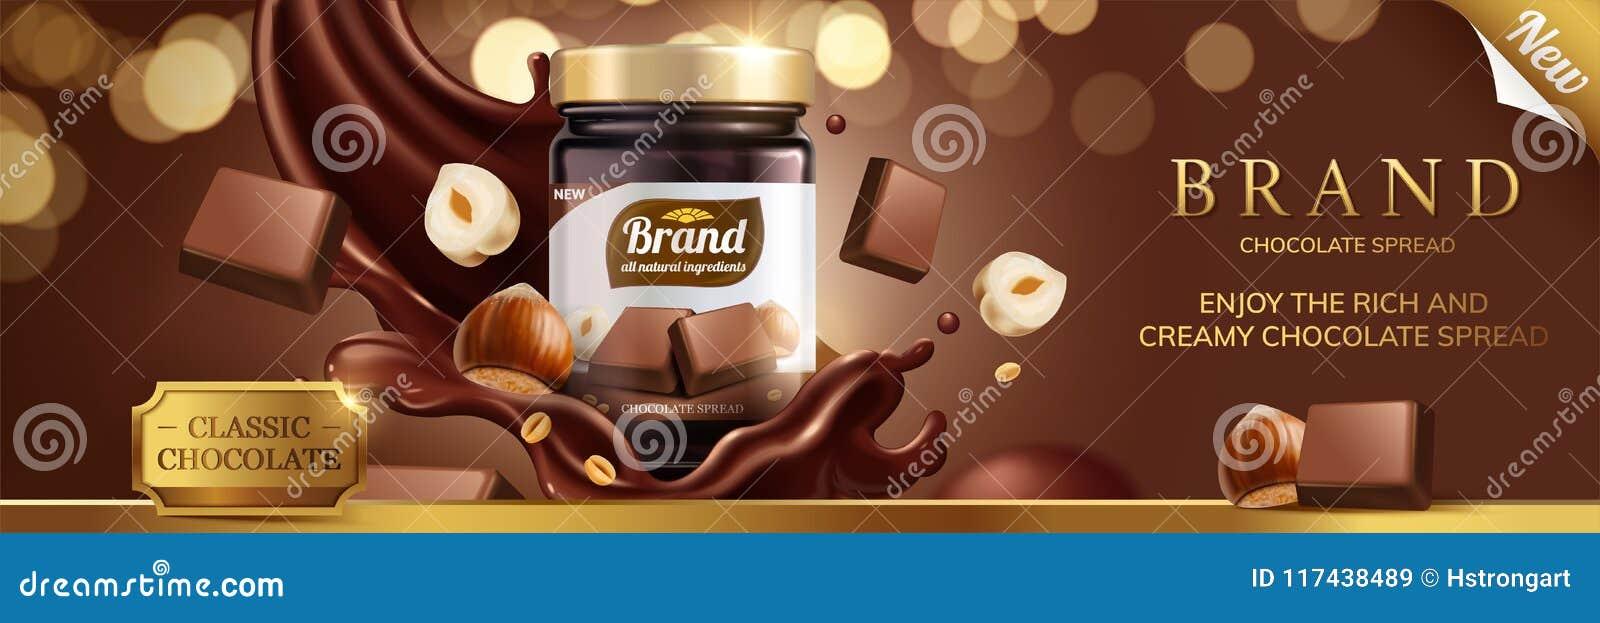 Diffusion classique de chocolat